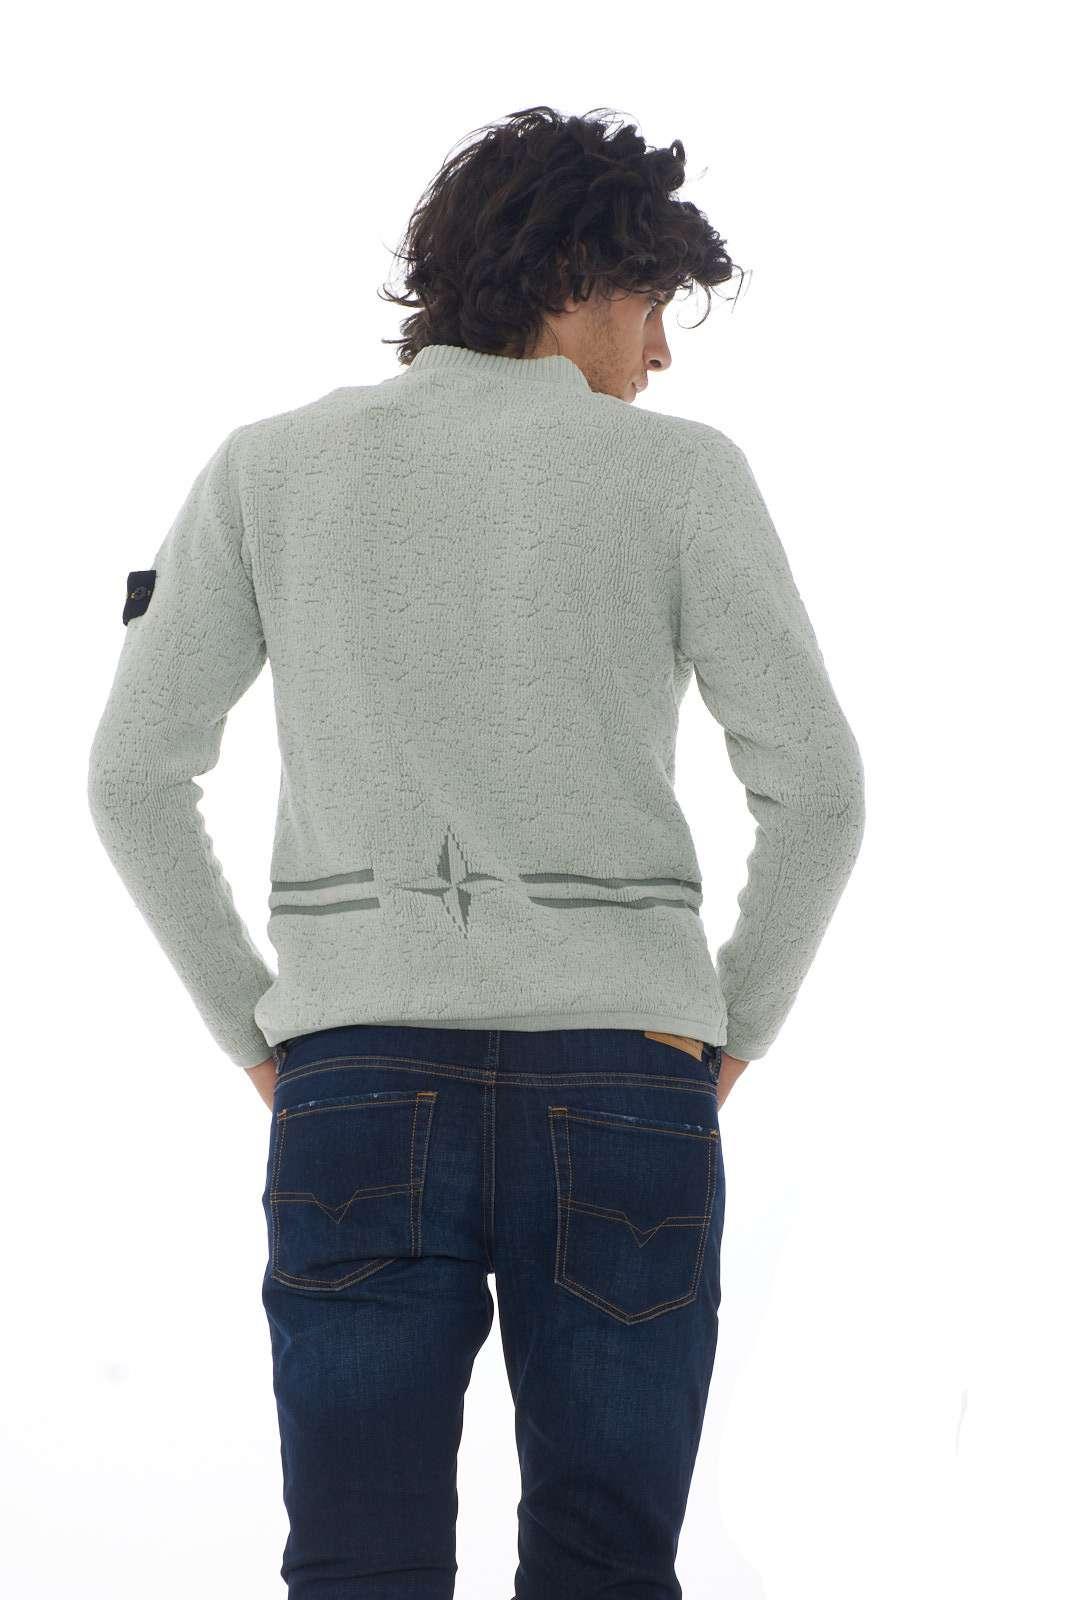 https://www.parmax.com/media/catalog/product/a/i/AI-outlet_parmax-maglia-uomo-Stone-Island-7115517B1-C.jpg